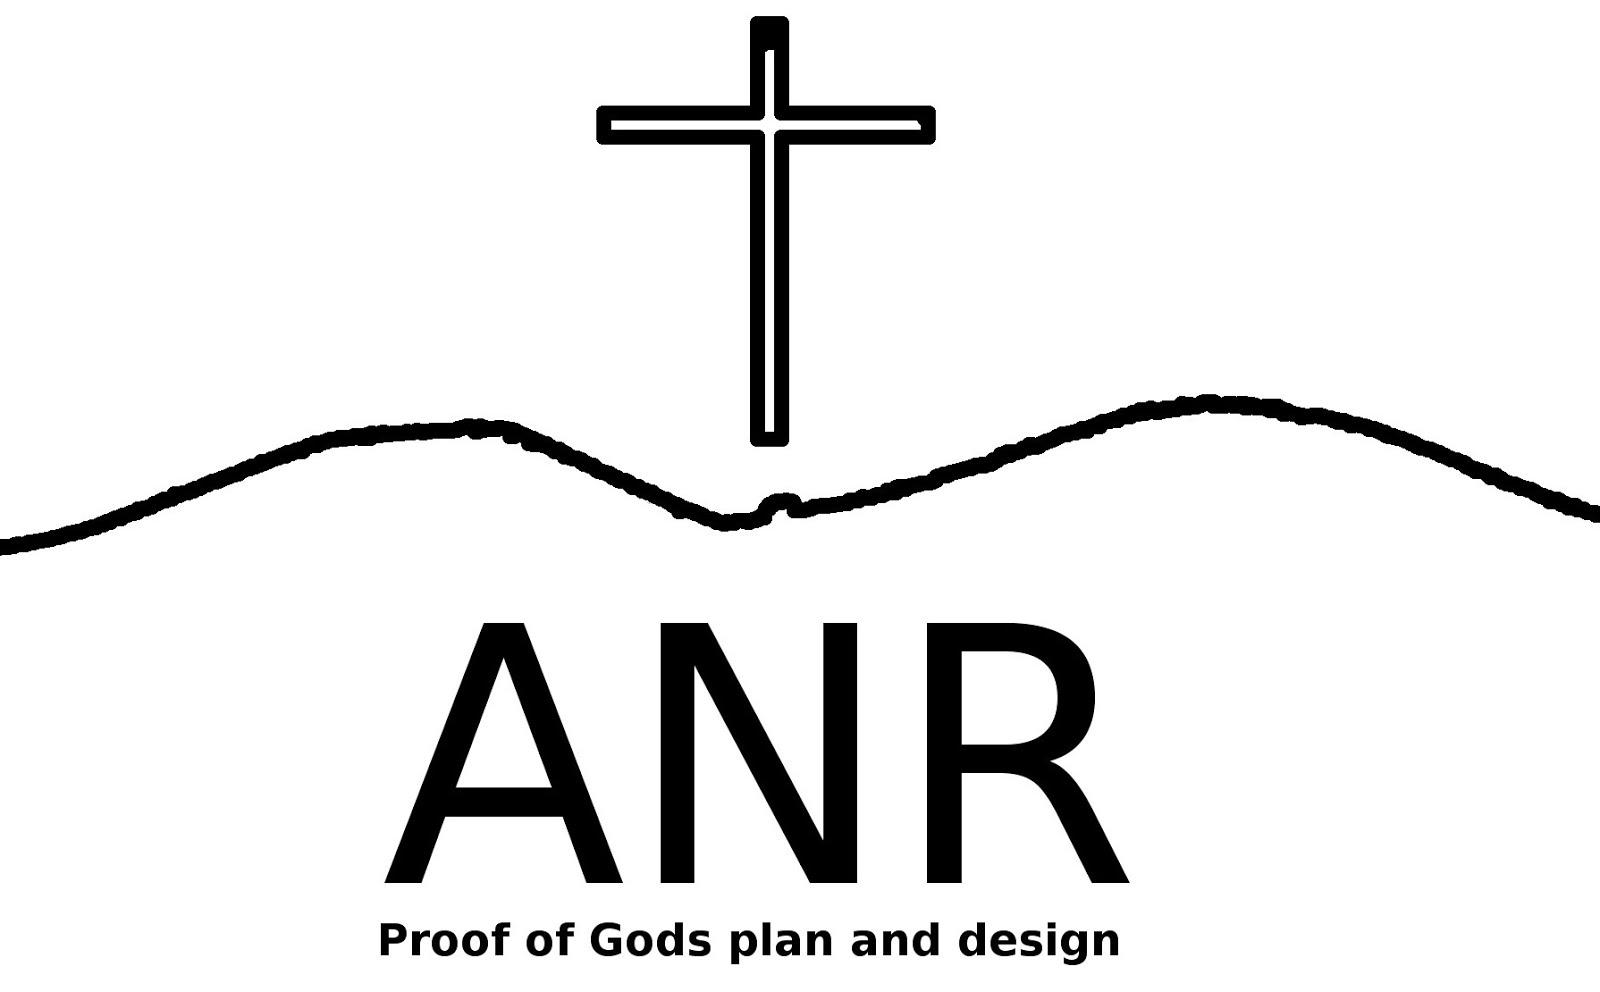 Anr abr